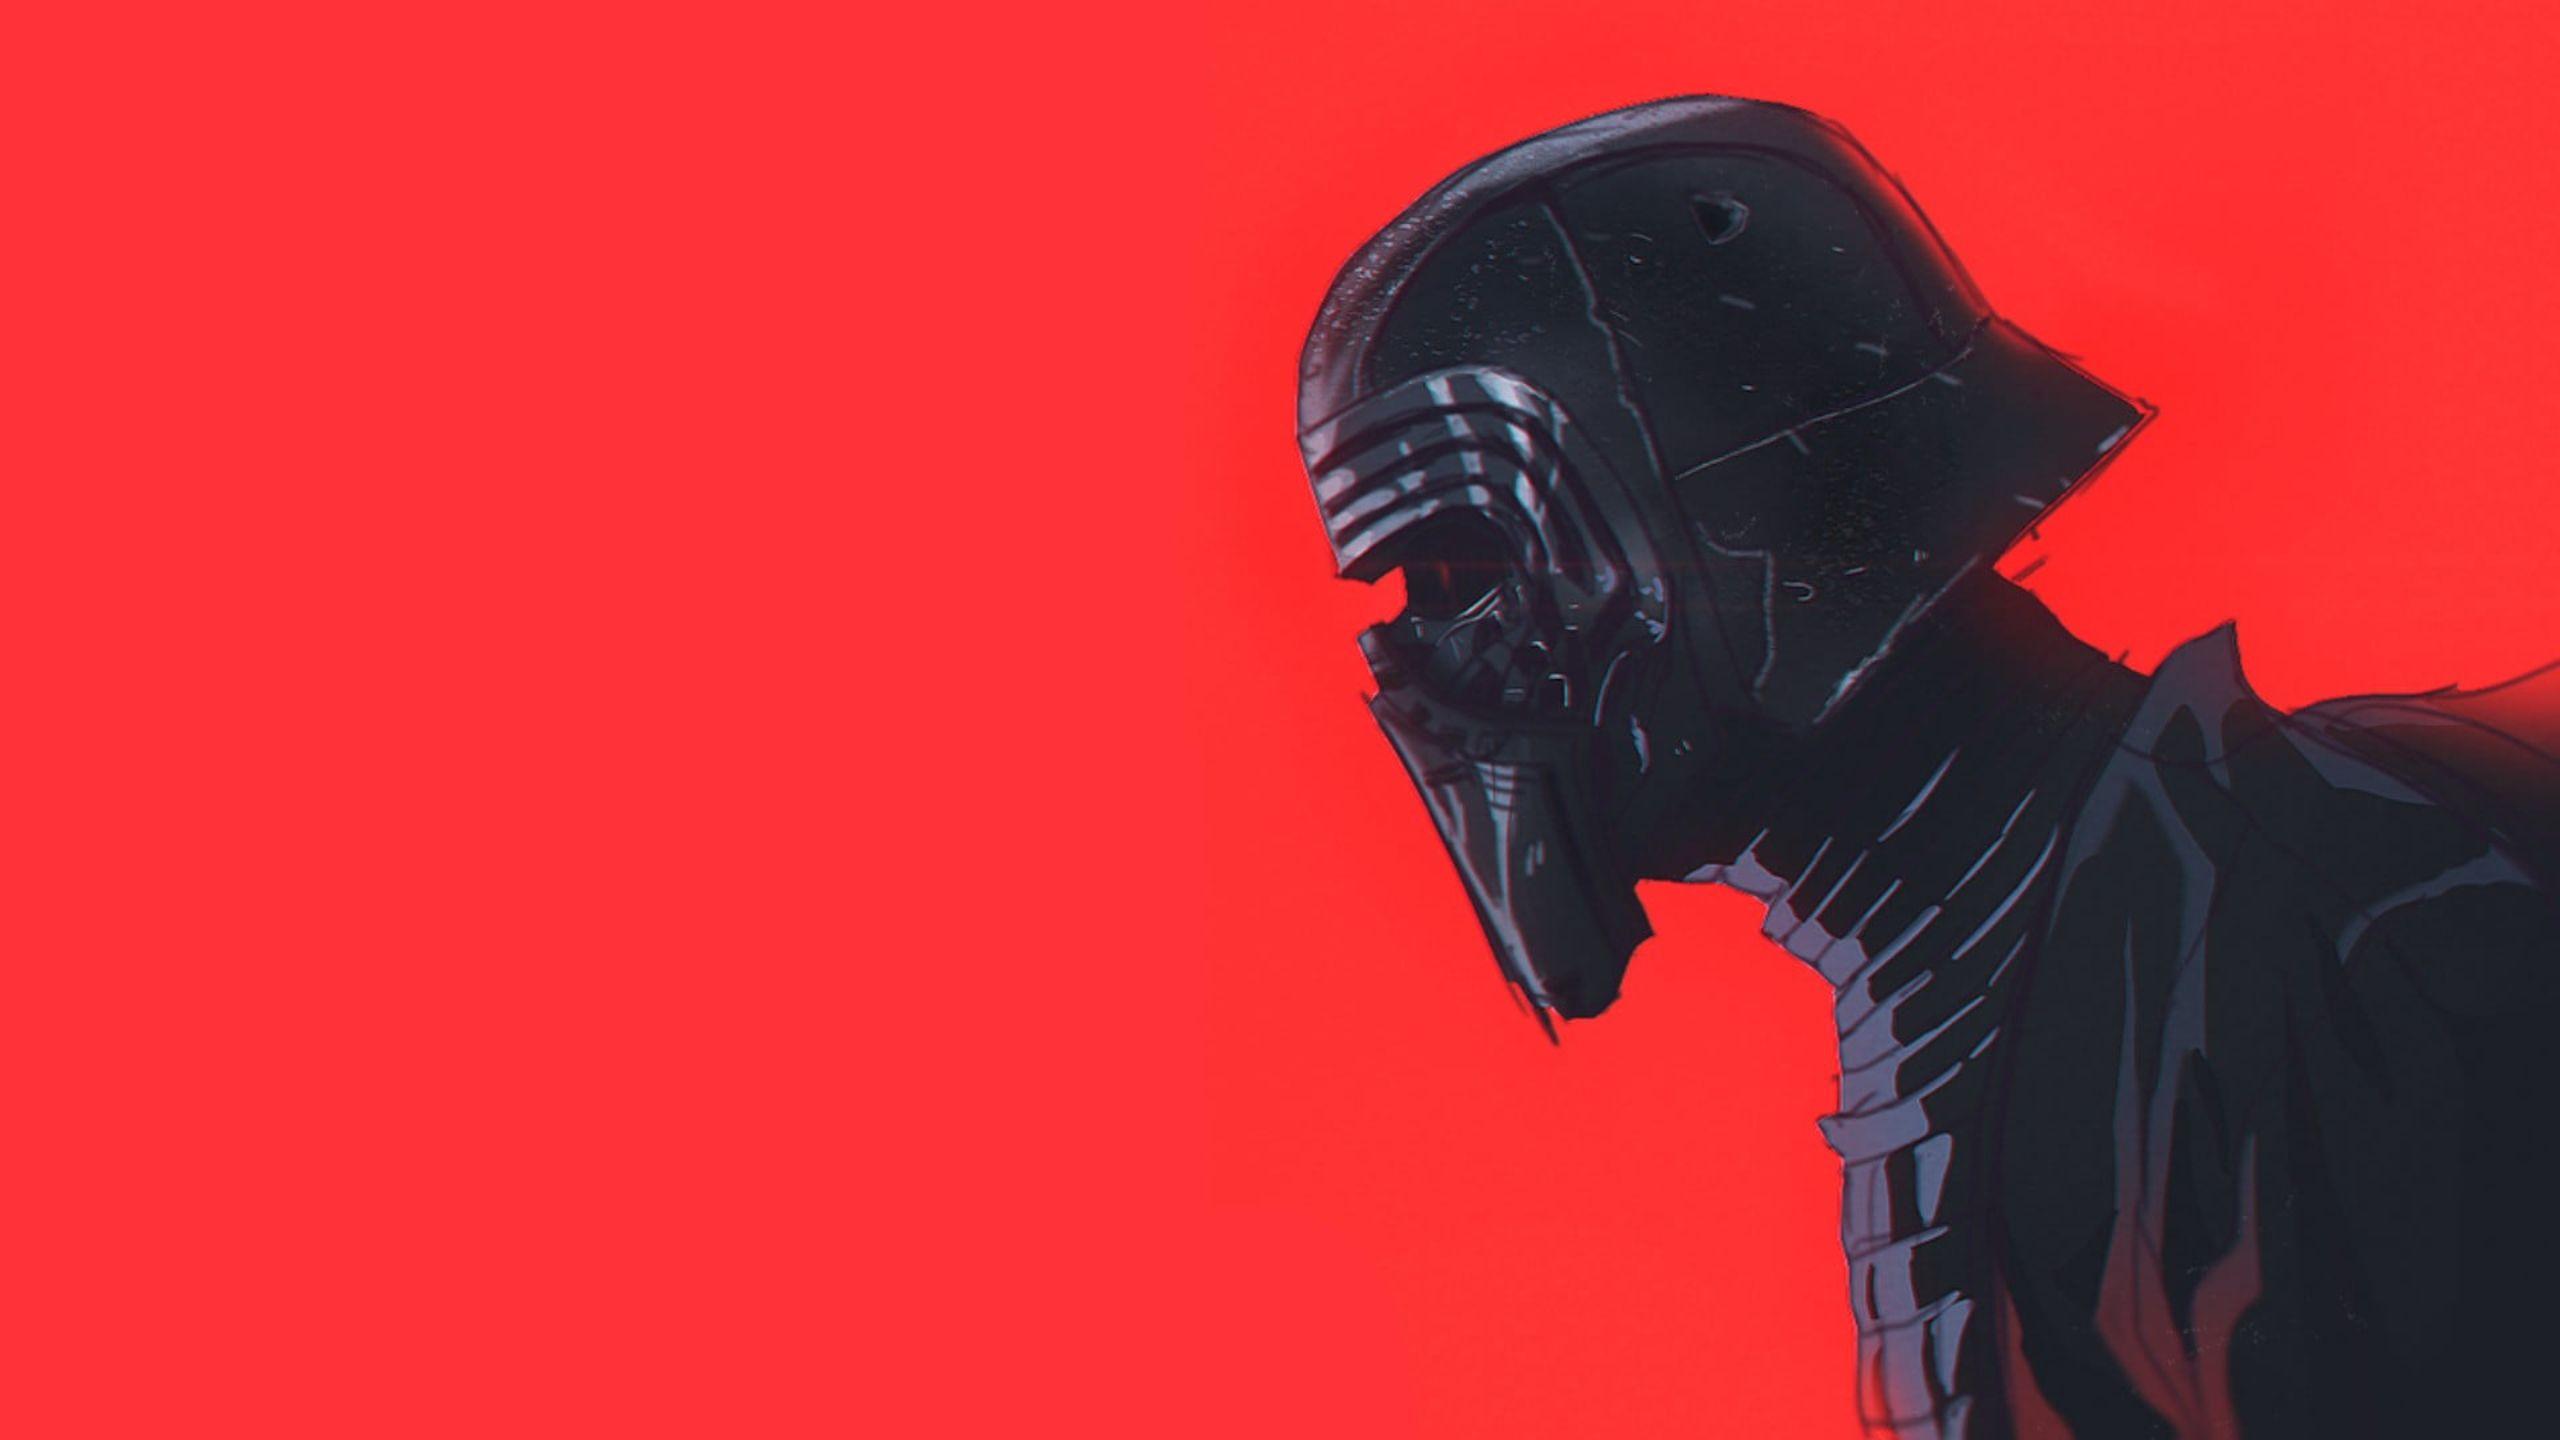 2560x1440px Free Download Hd Wallpaper Dart Vader Illustration Kylo Ren Star Wars Mask Red Kylo Ren Wallpaper Star Wars Wallpaper Star Wars Background